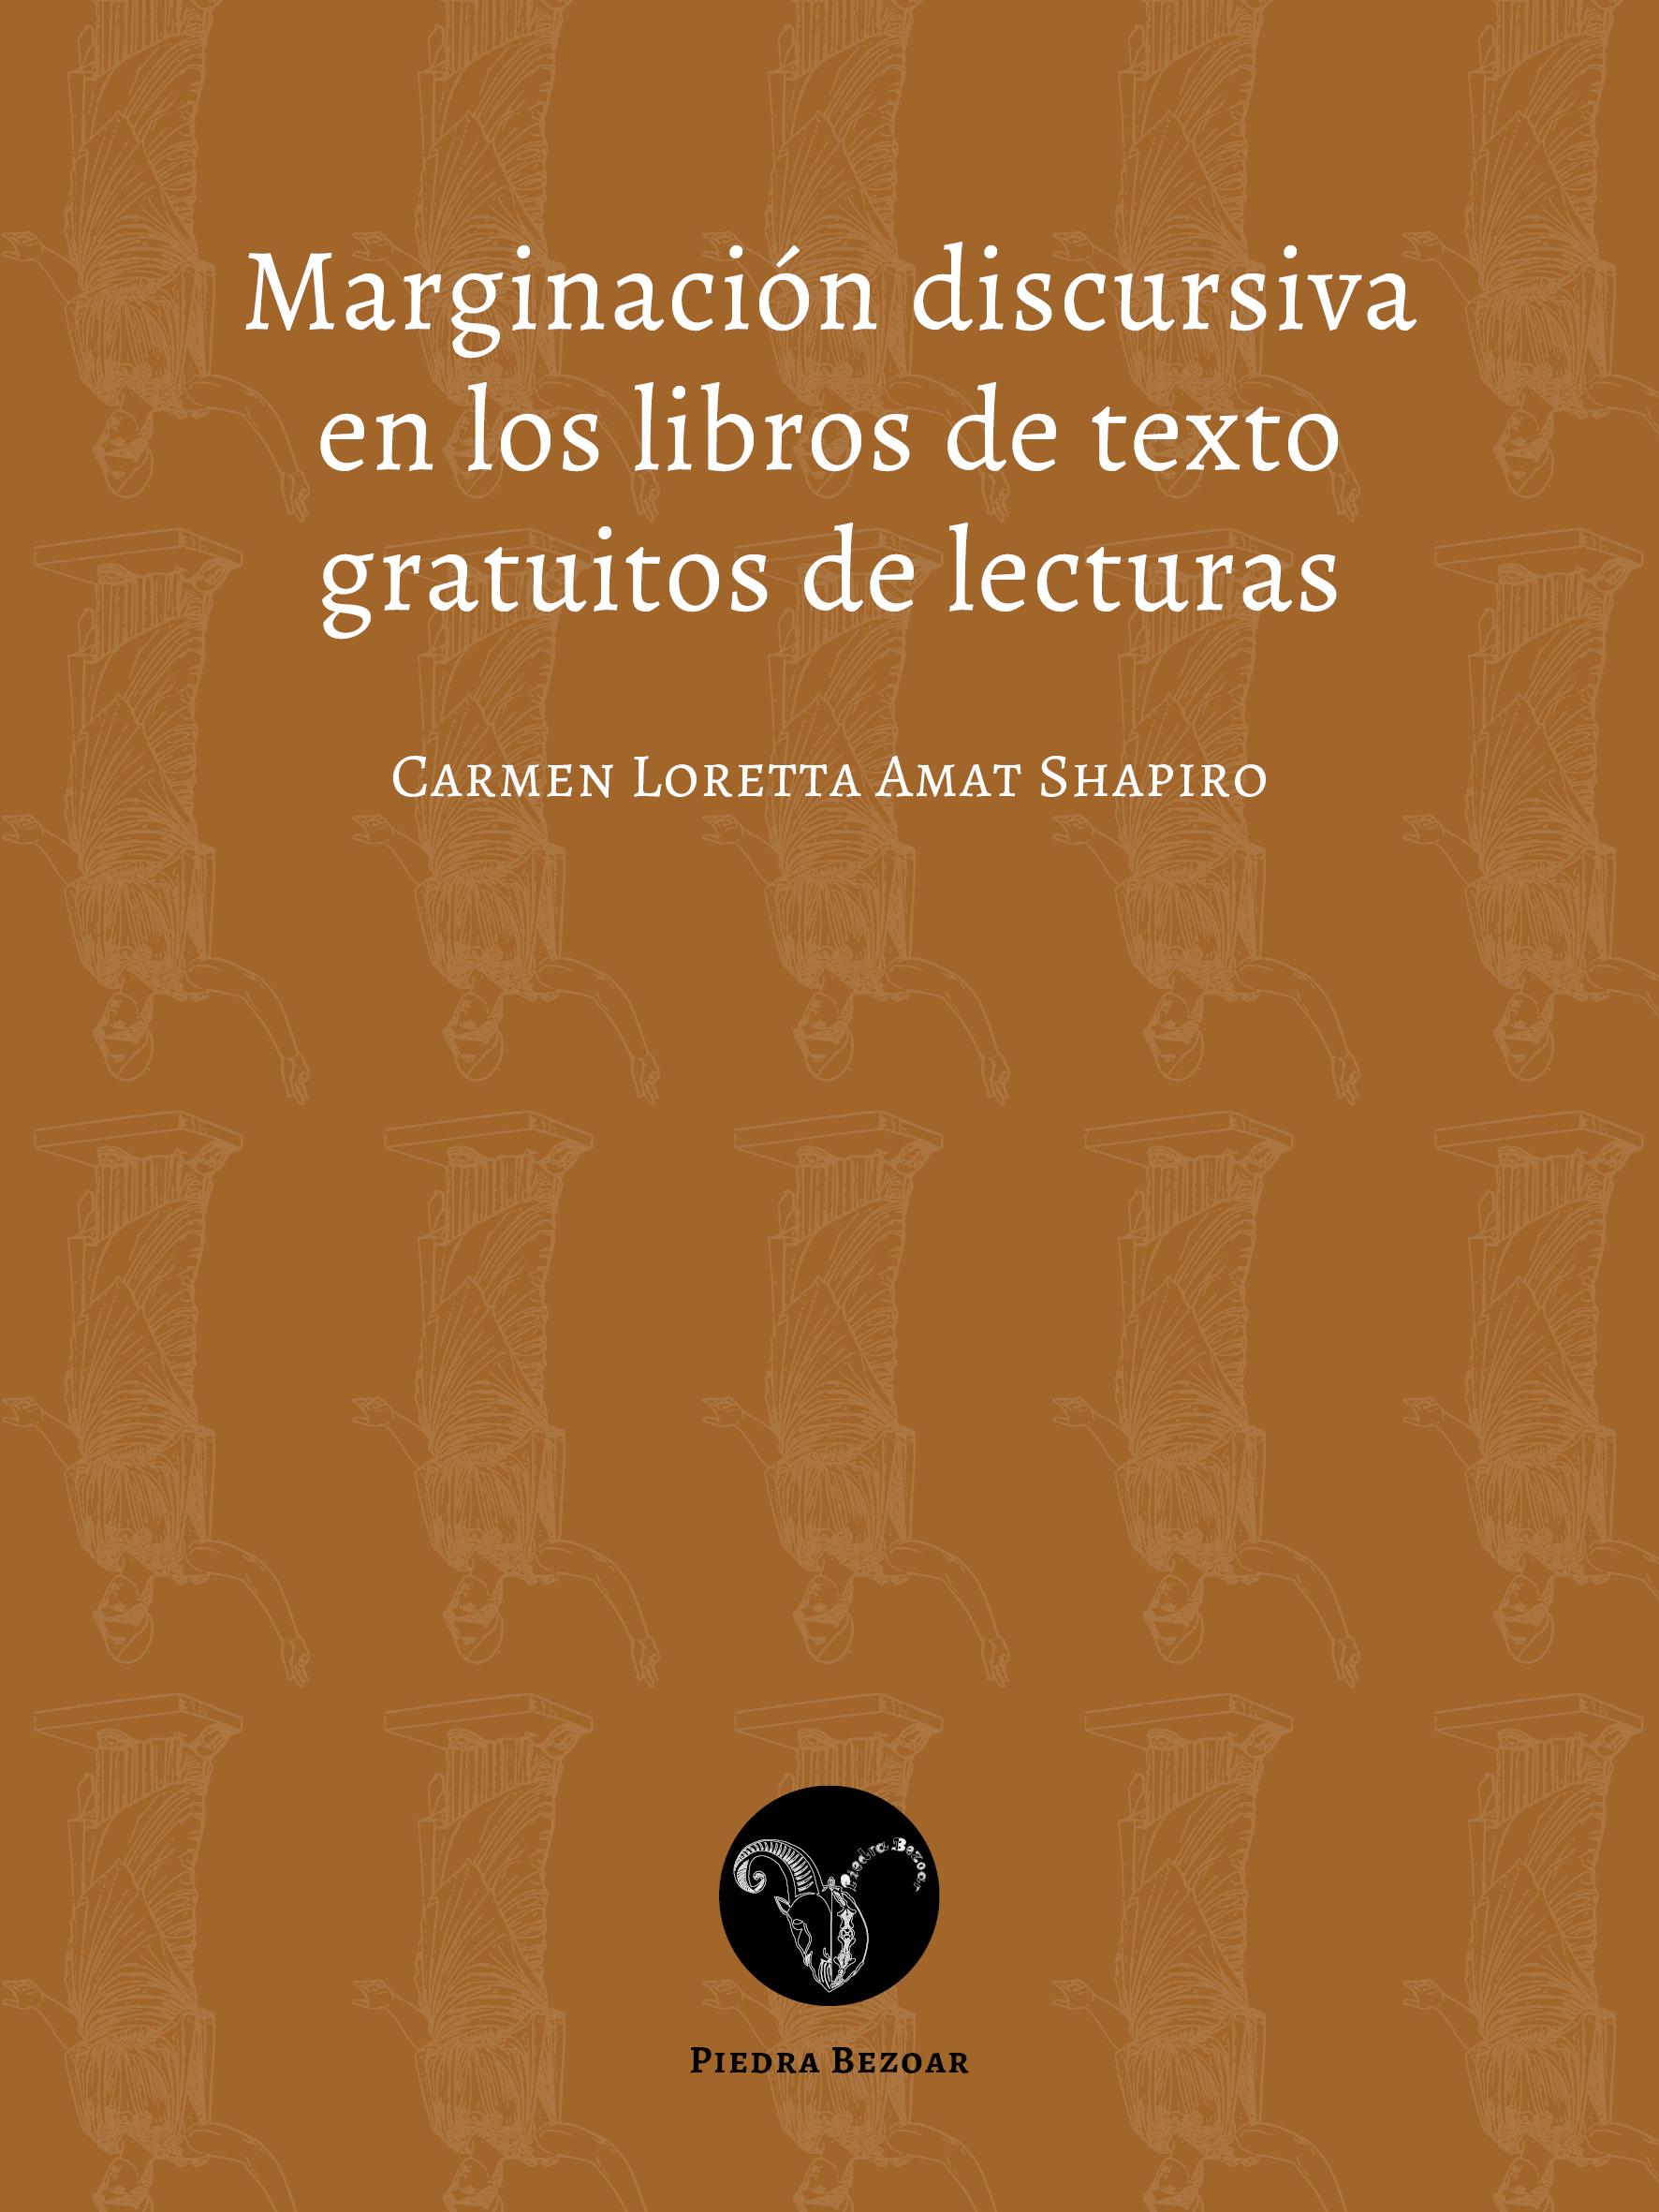 Carmen Loretta Amat Shapiro